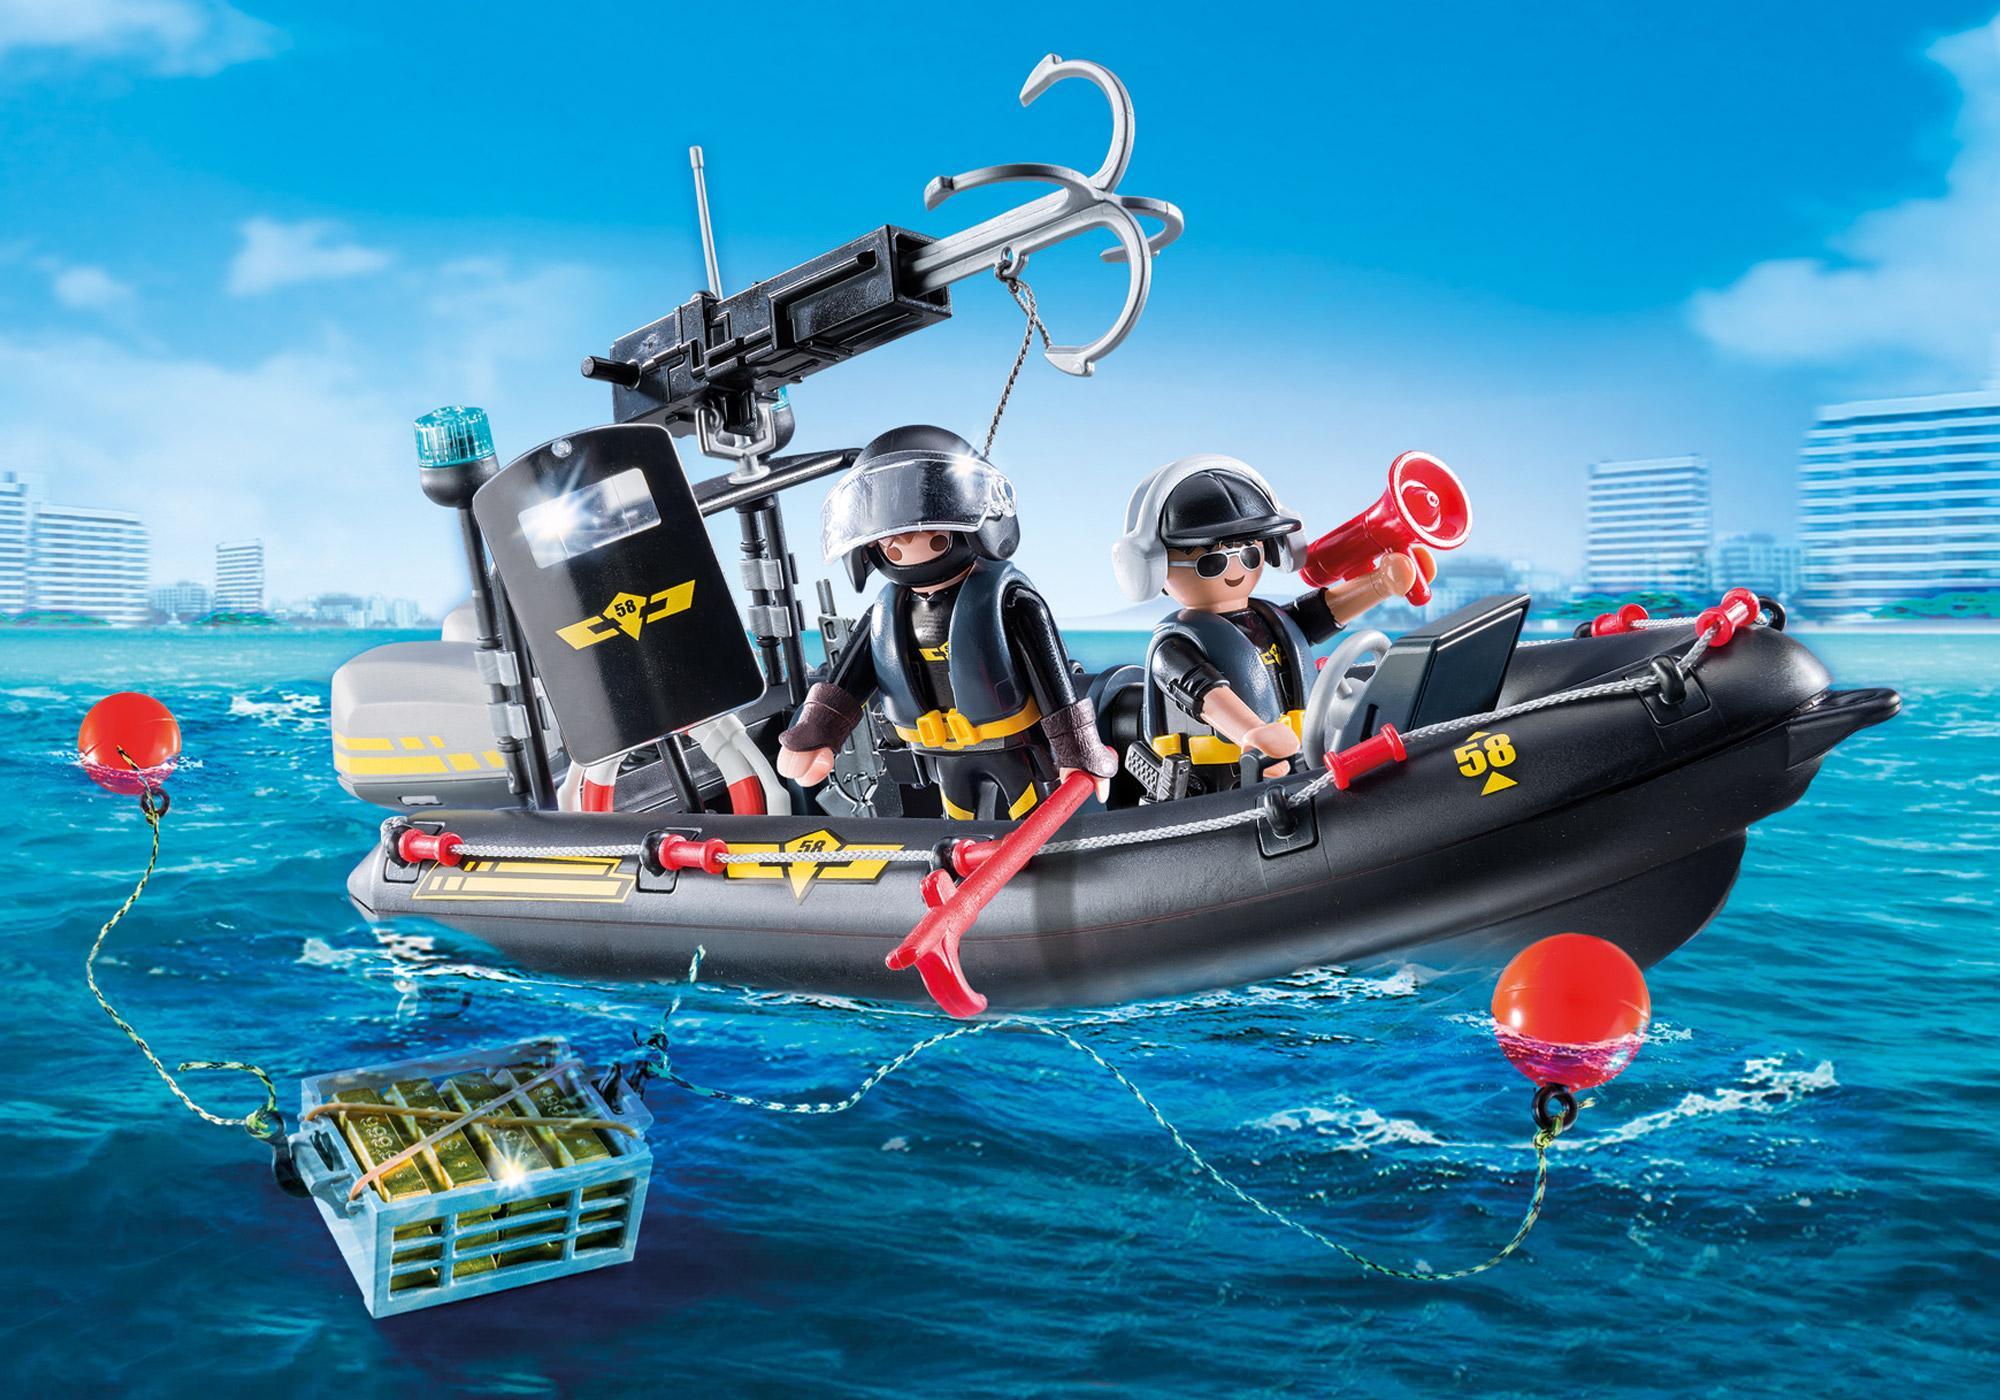 http://media.playmobil.com/i/playmobil/9362_product_detail/Gommone Unità Speciale con refurtiva